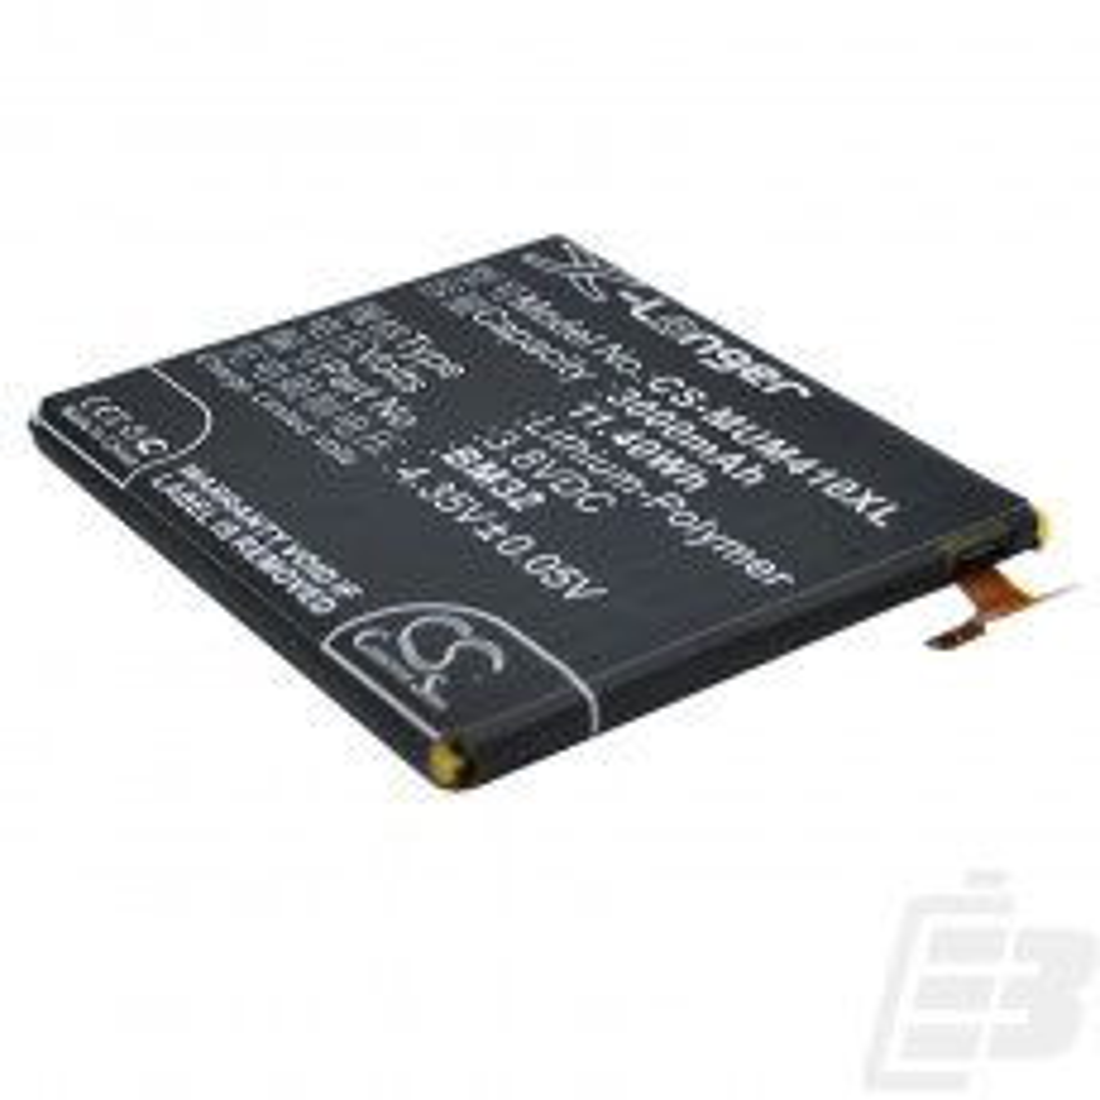 Smartphone battery Xiaomi mi4_1